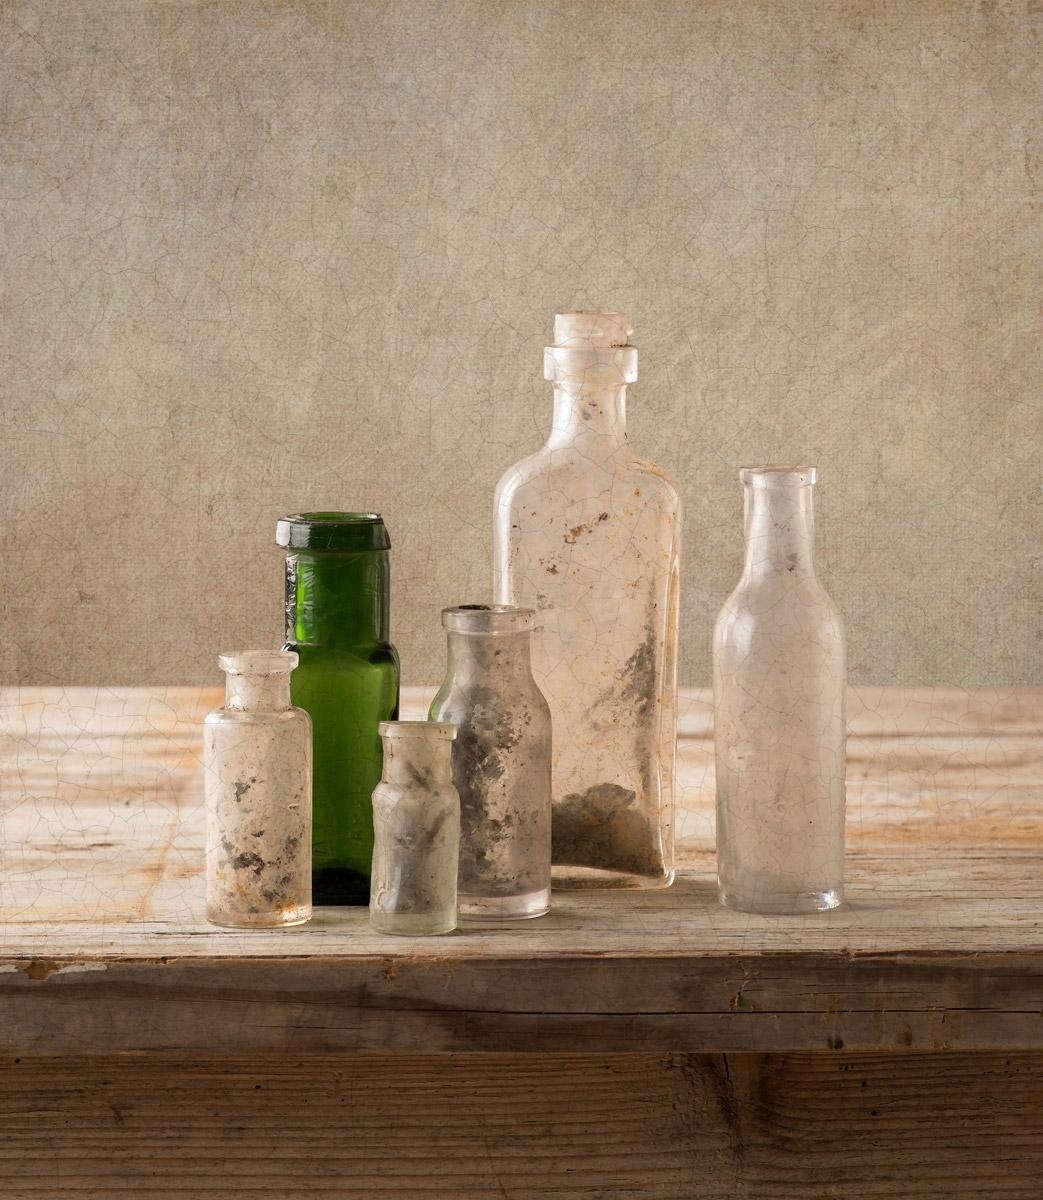 Lamulle - vintage, bottles, french - tinekestoffels | ello